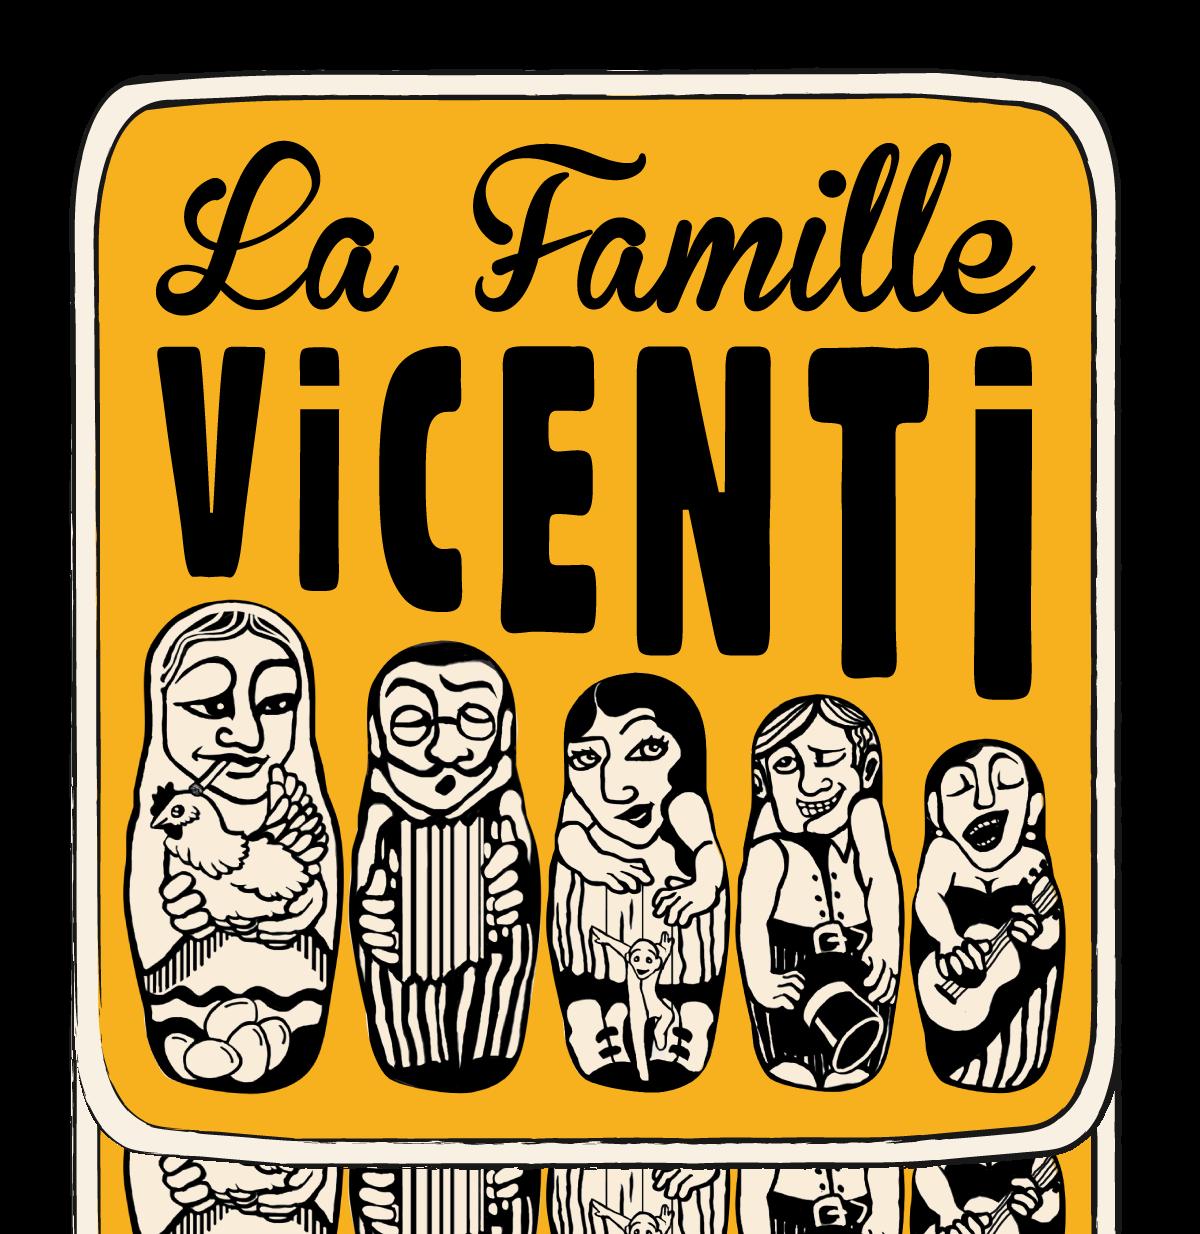 logo vicenti